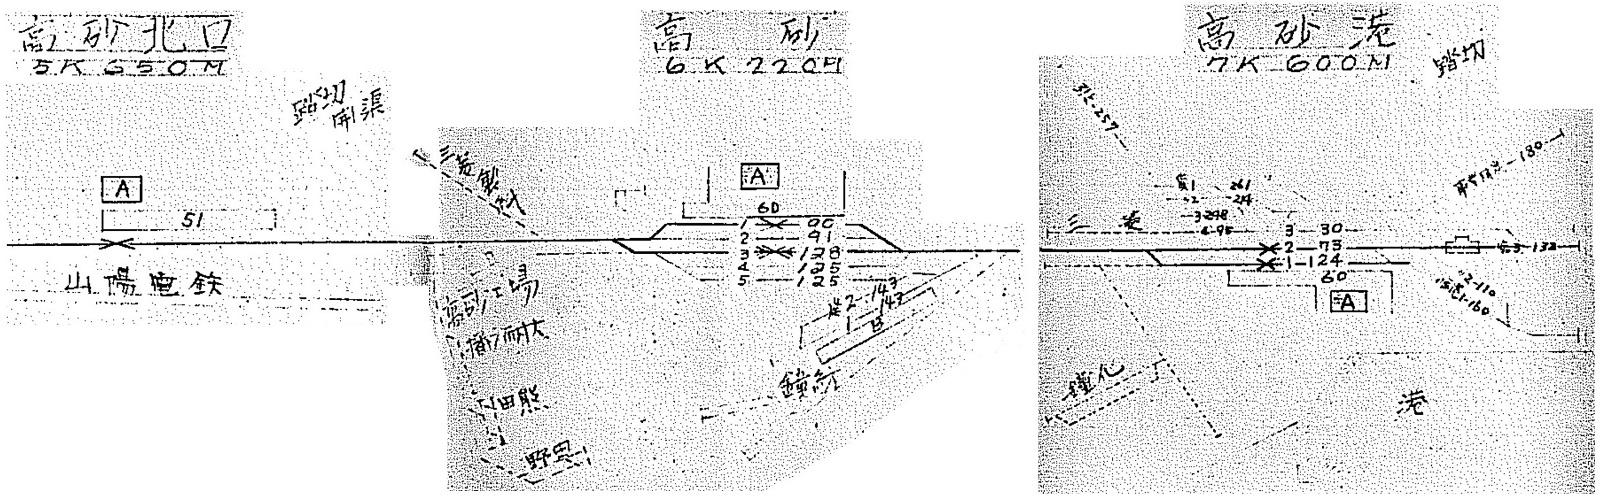 1959012r